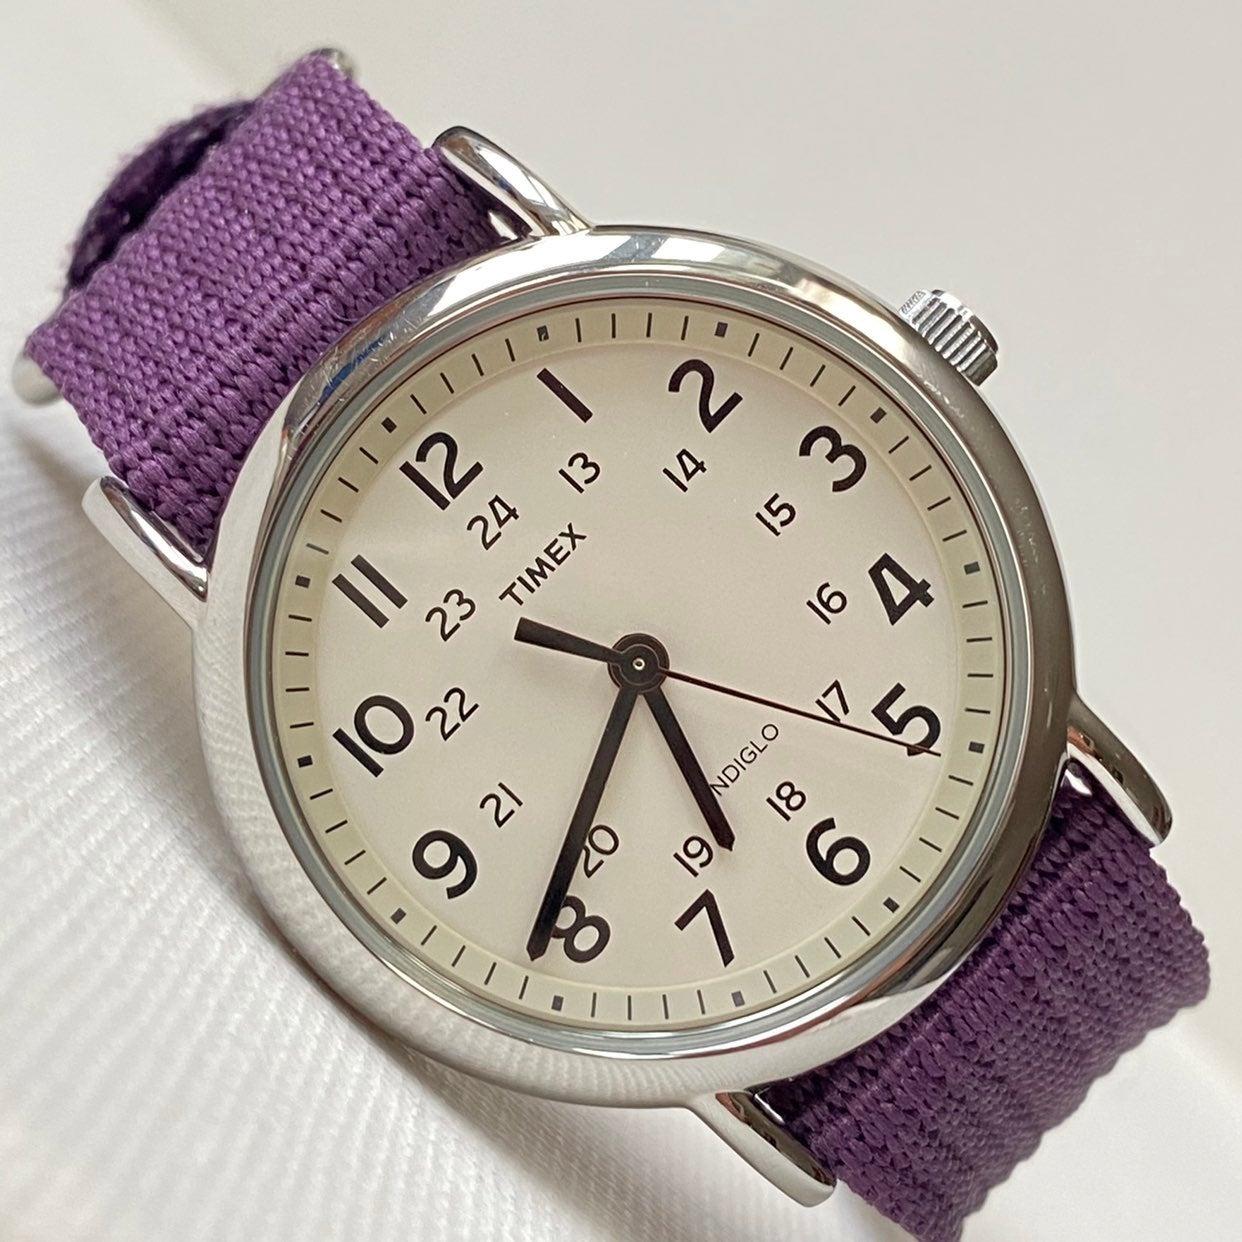 Timex Weekender Indiglo Women's Watch